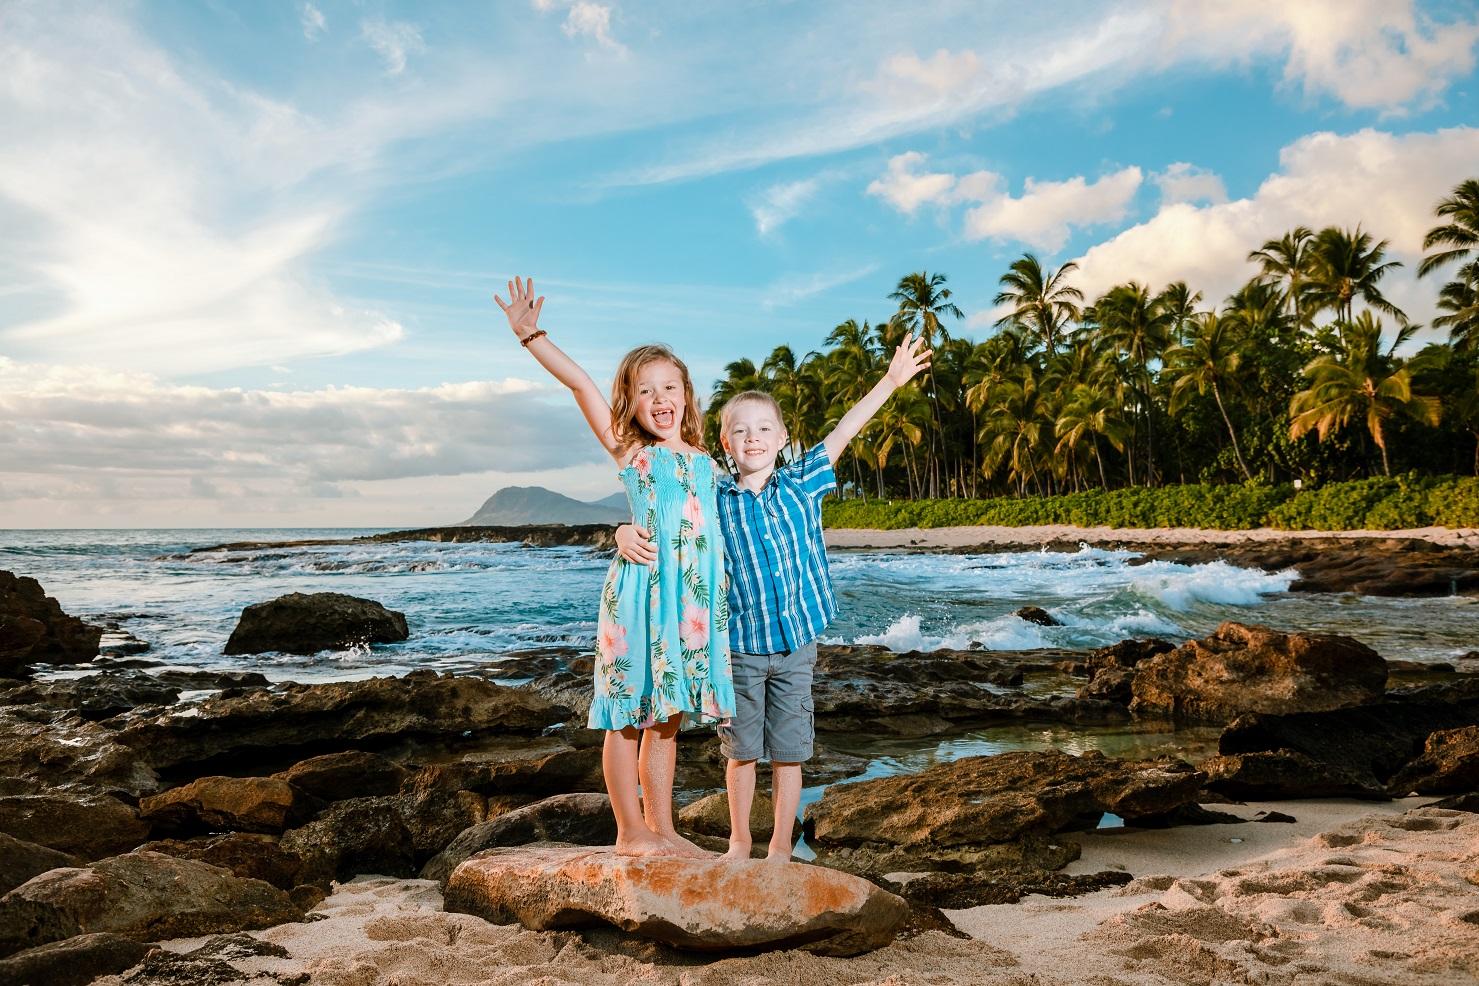 Oahu2018-48550.jpg